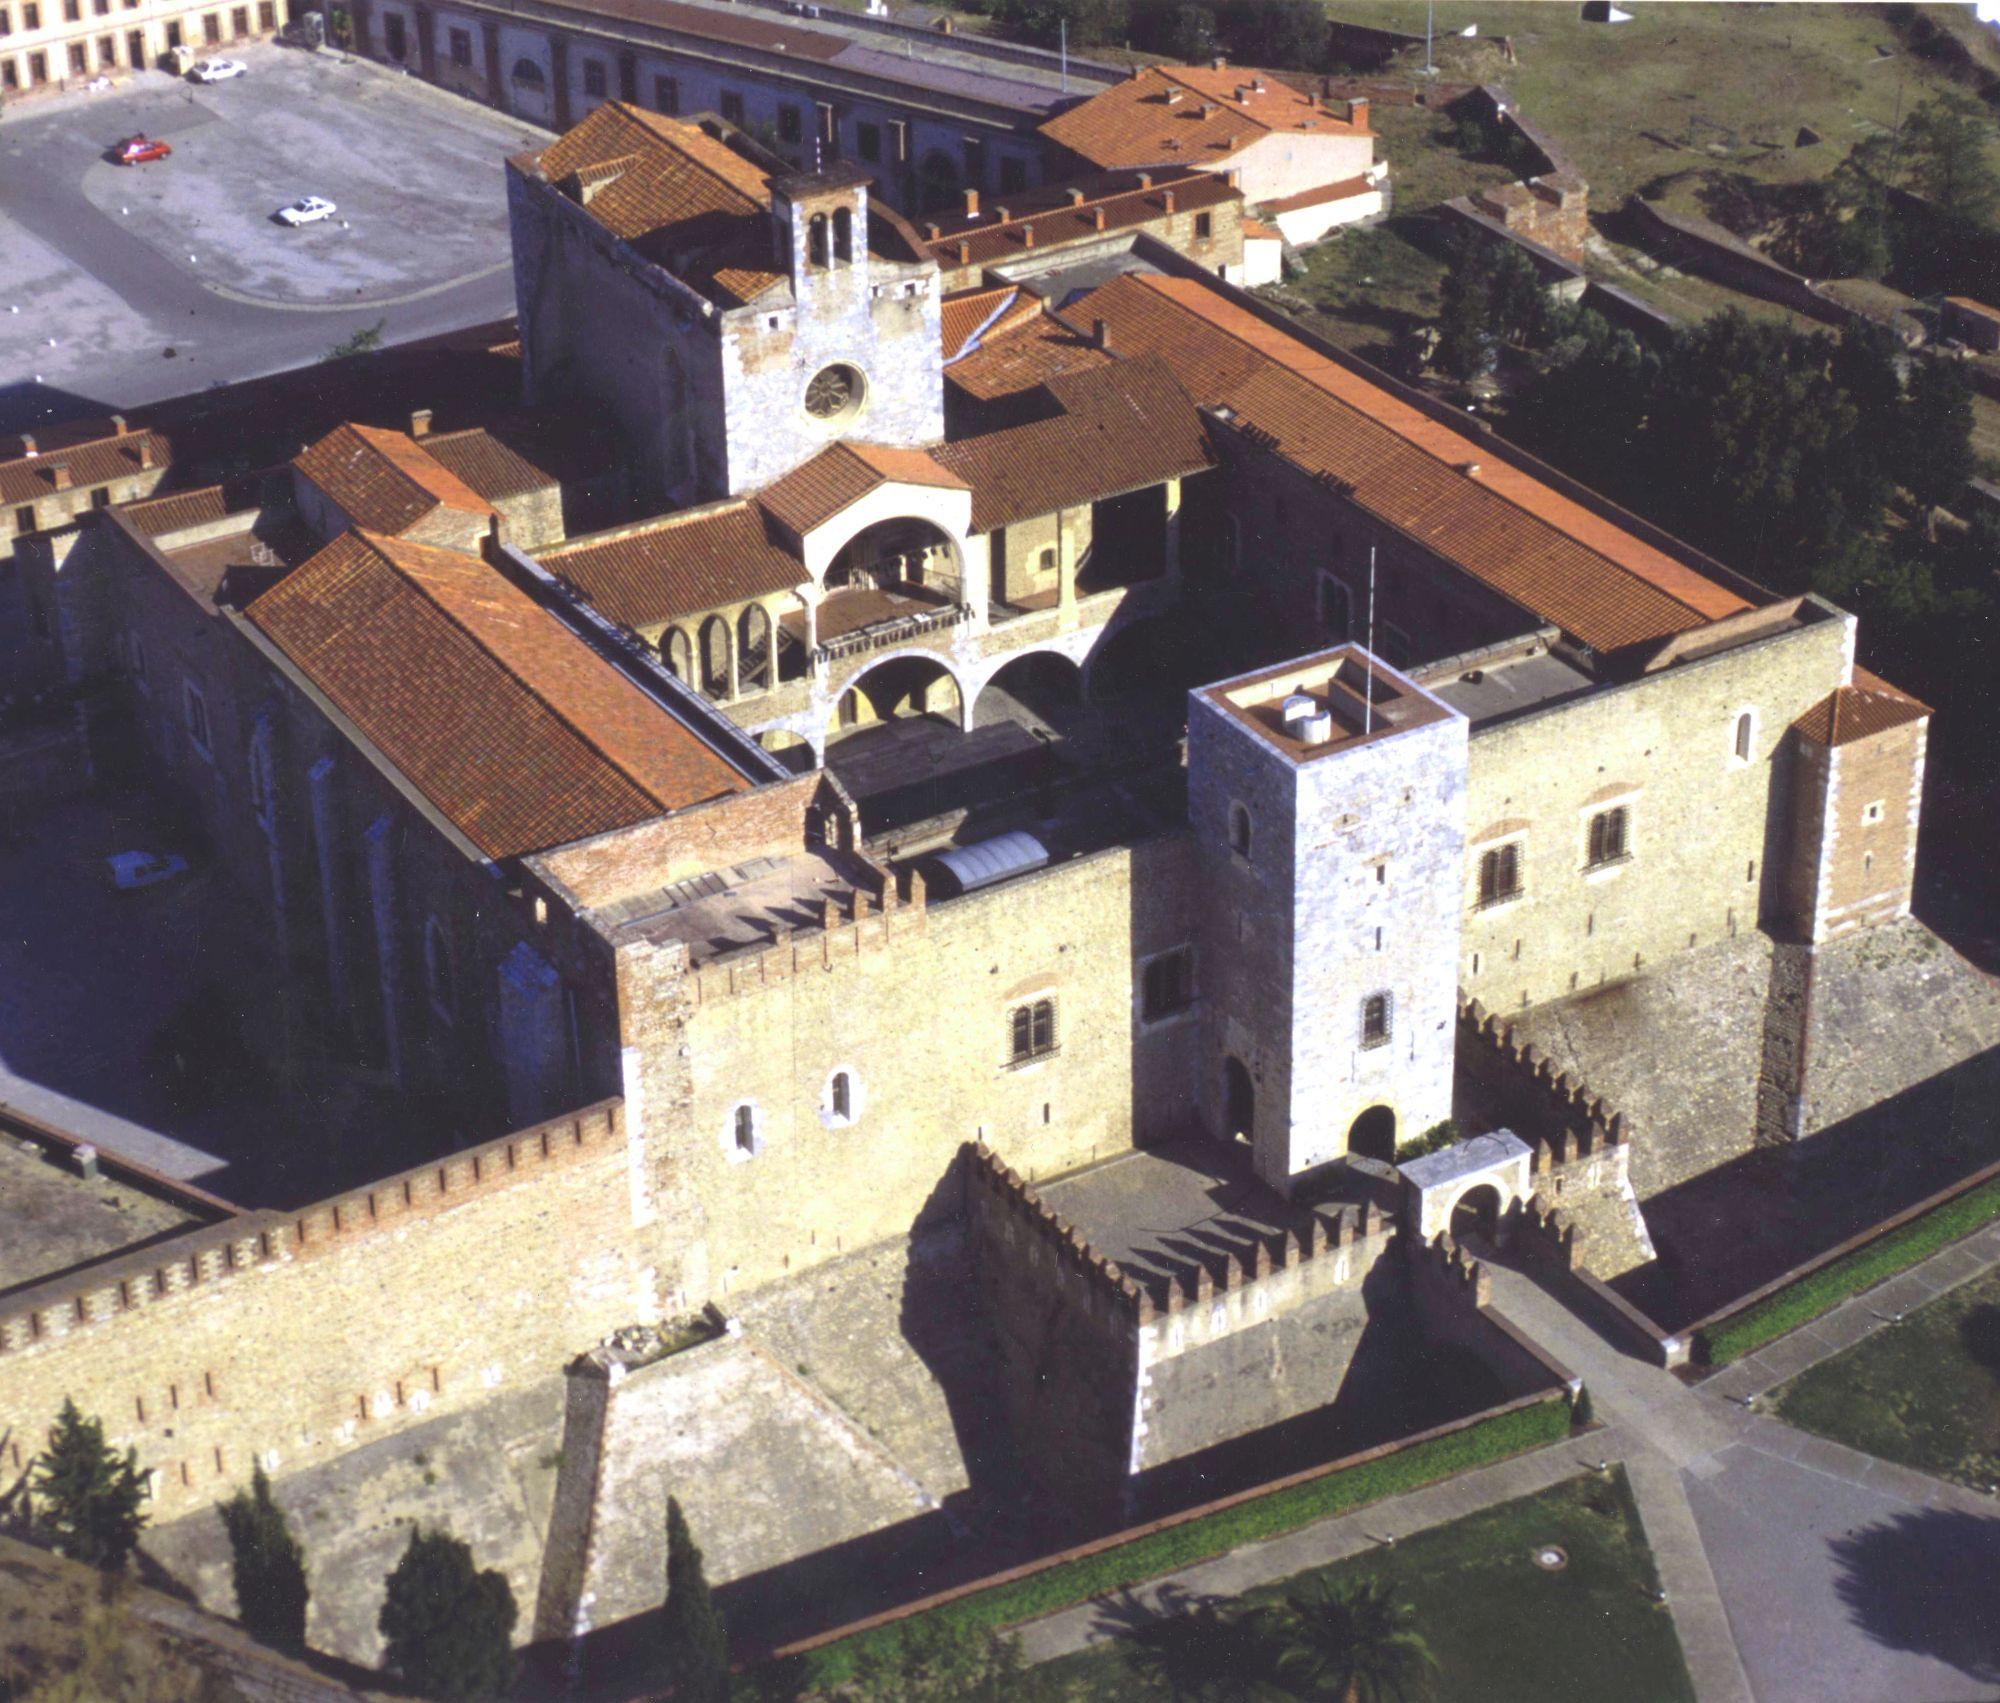 Le palais des rois de majorque perpignan la catalane perpiny la catalana - Palais des rois de majorque perpignan ...